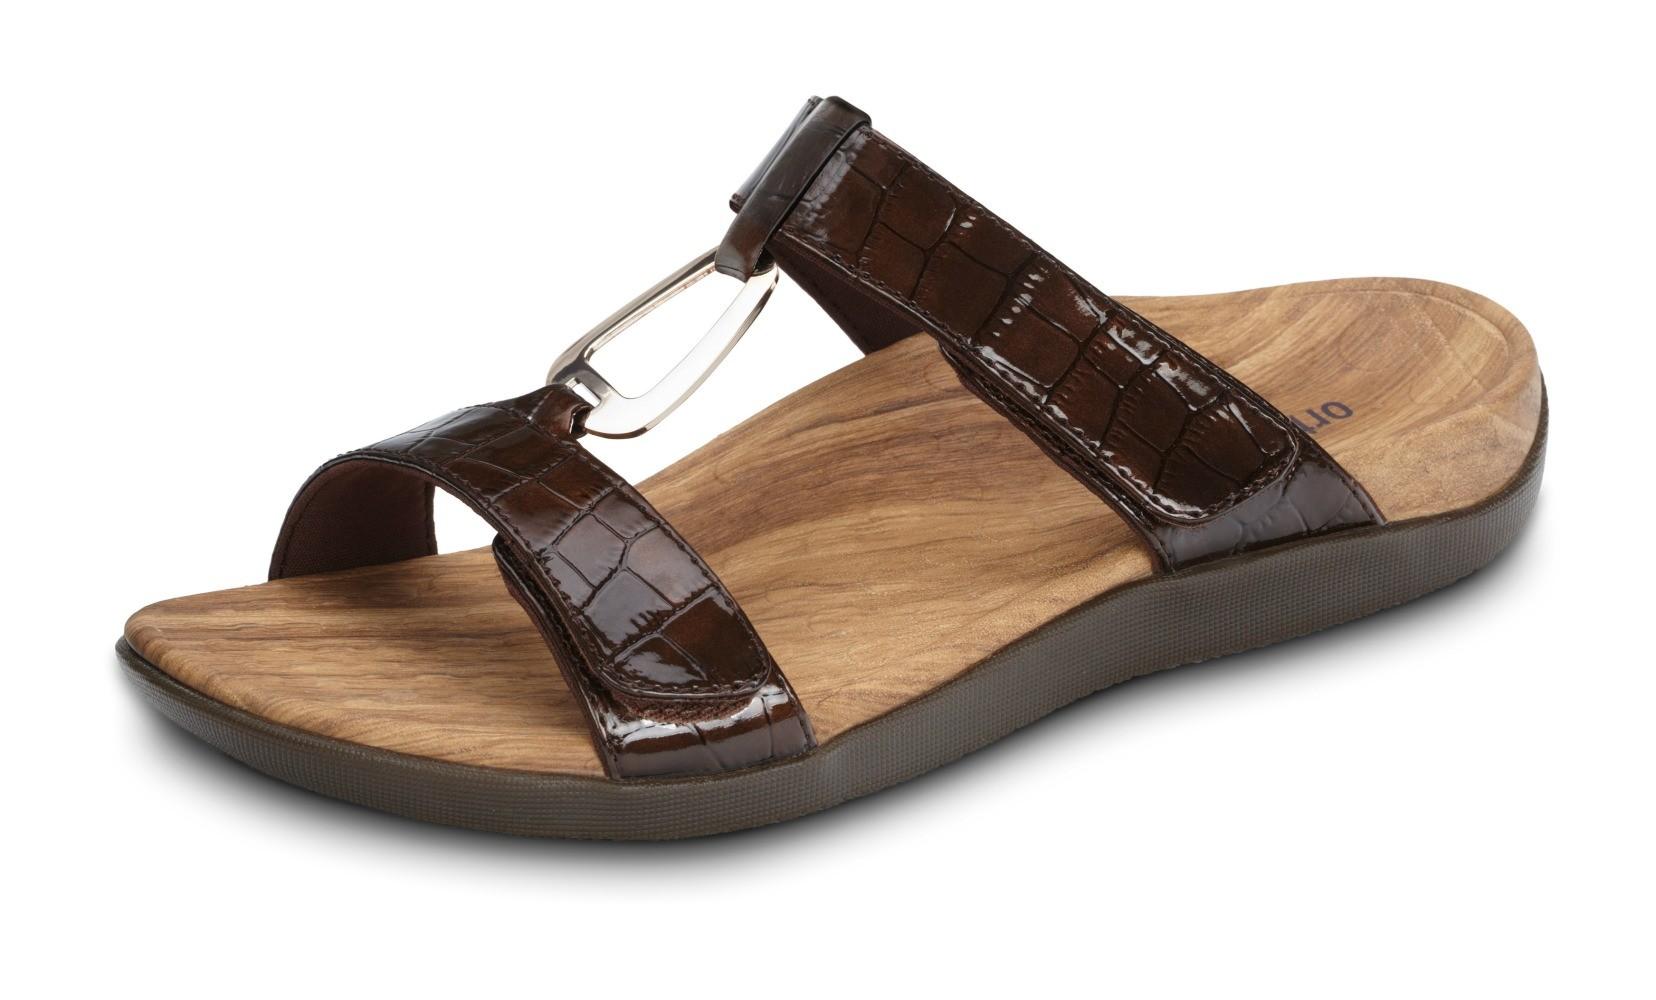 Orthaheel Layla II Slide Brandy Patent Crocodile Size 10 Online Discount